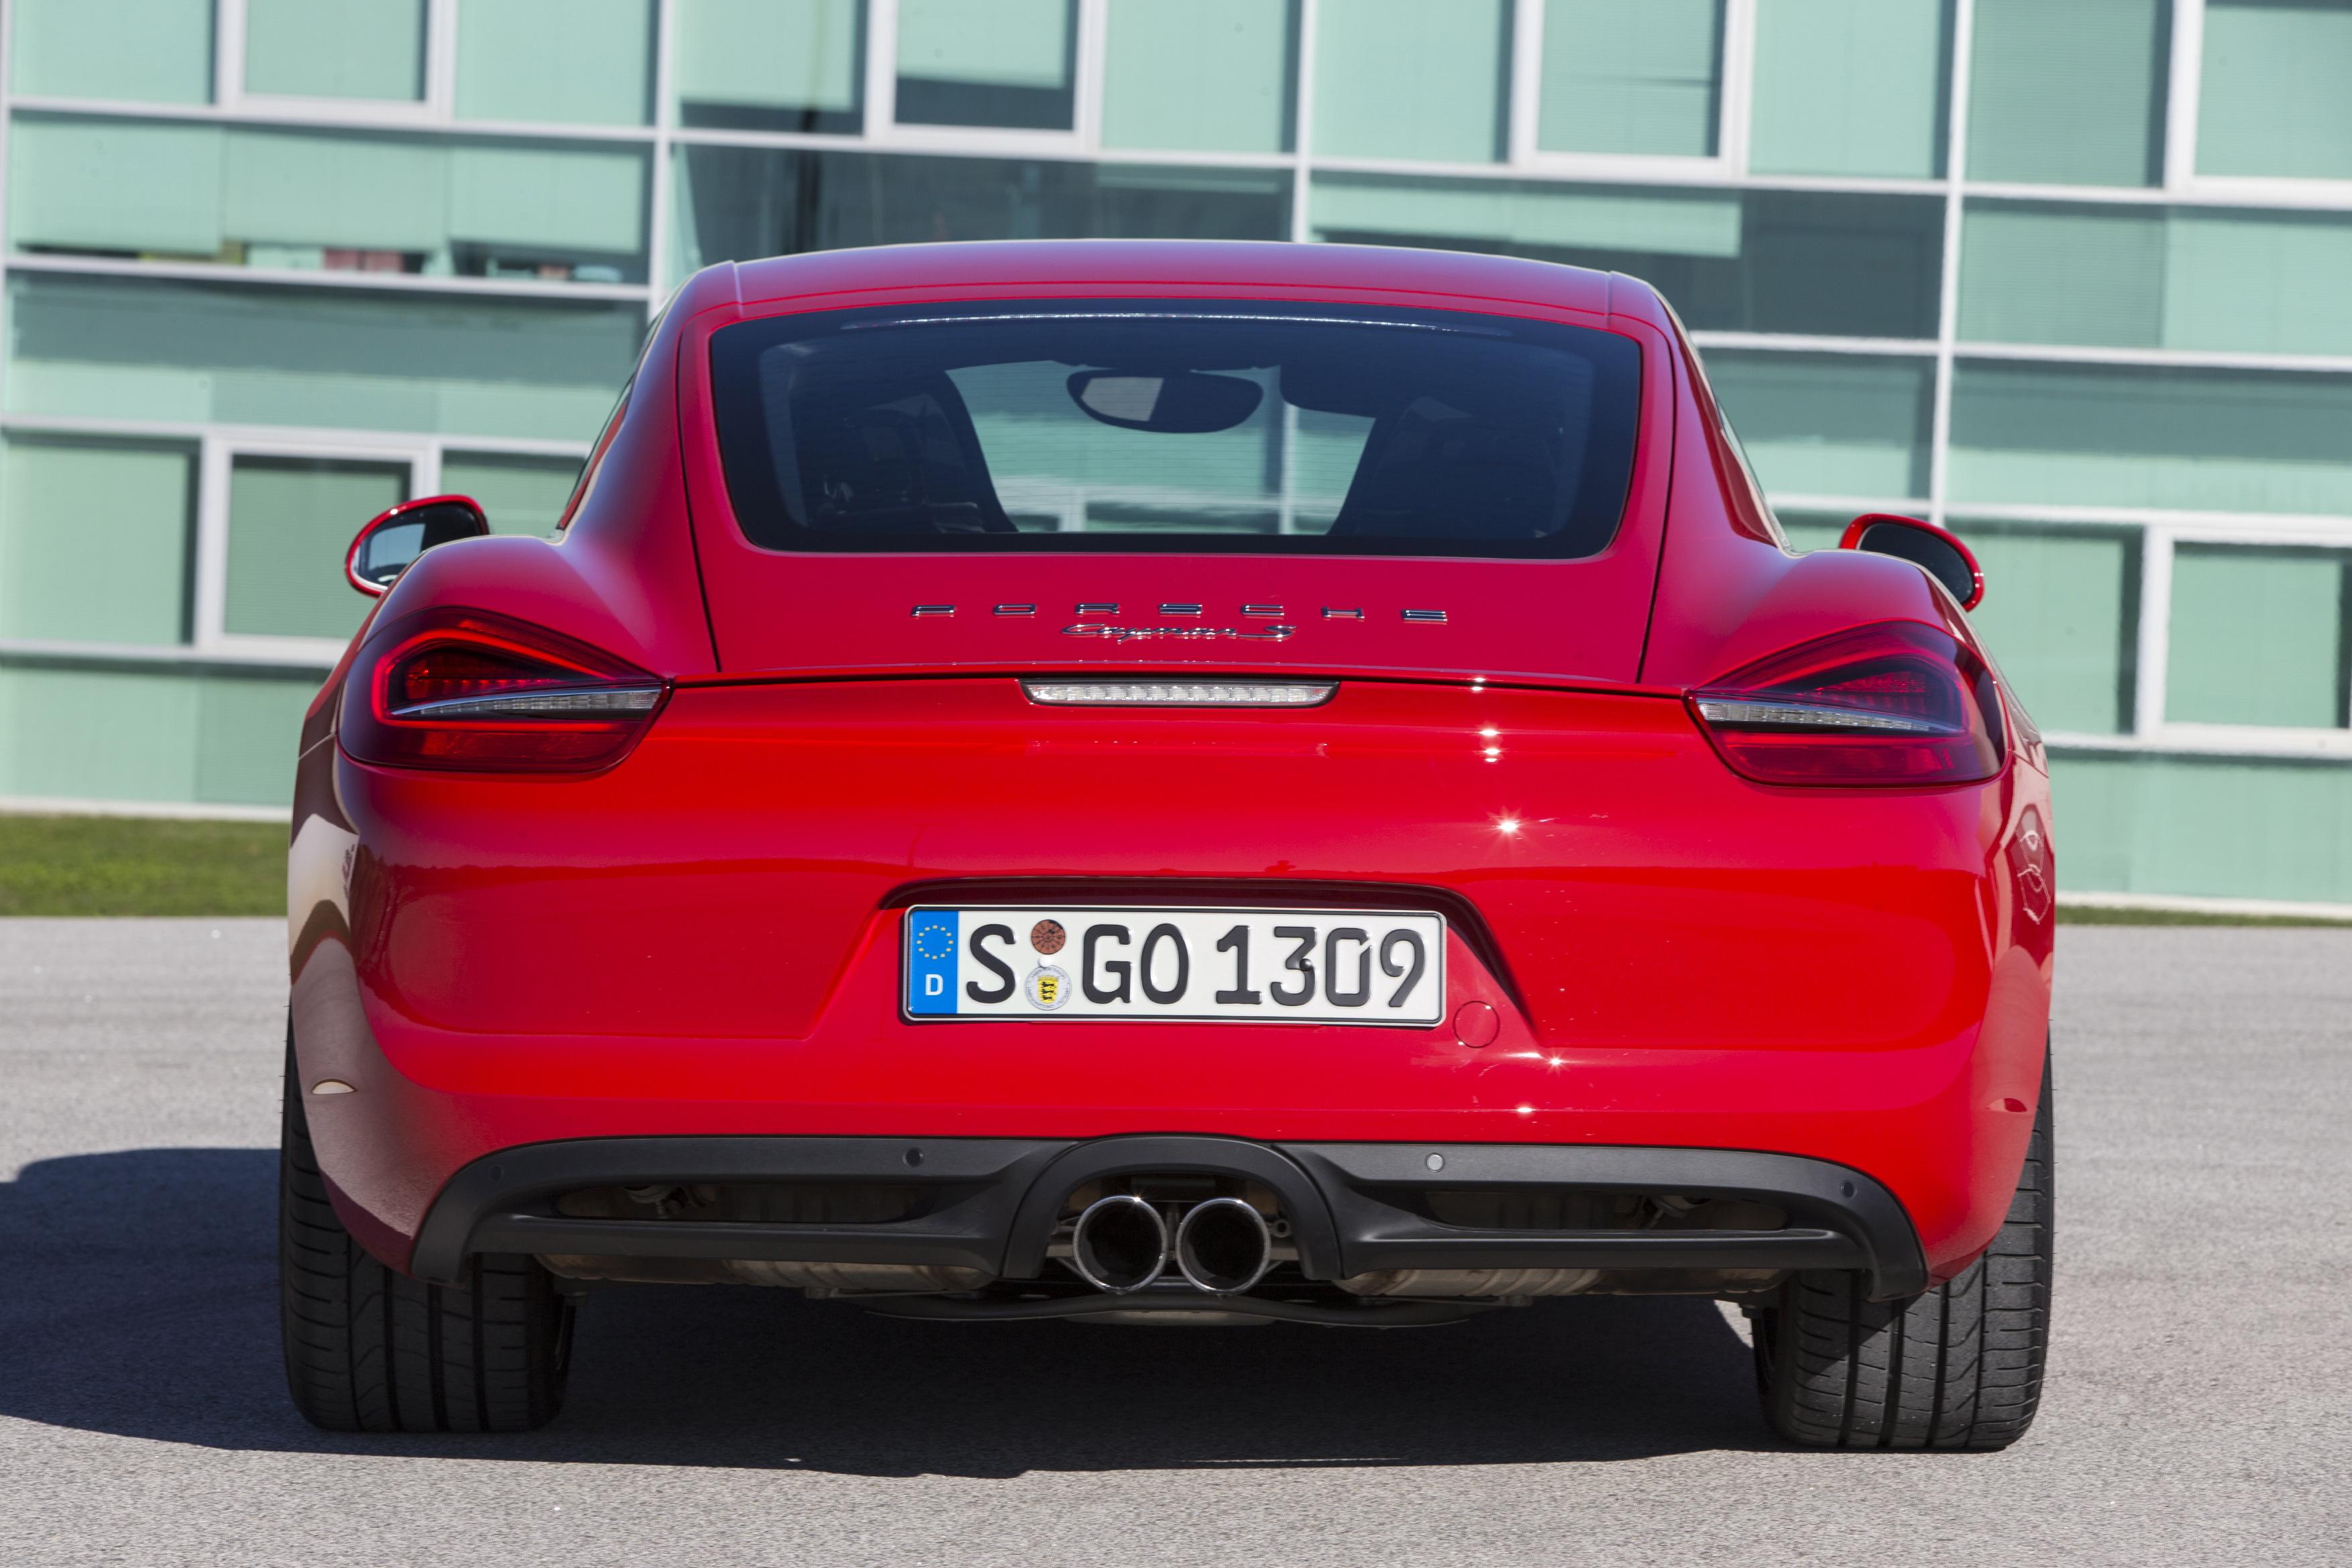 2014 Porsche Cayman Rear Photo